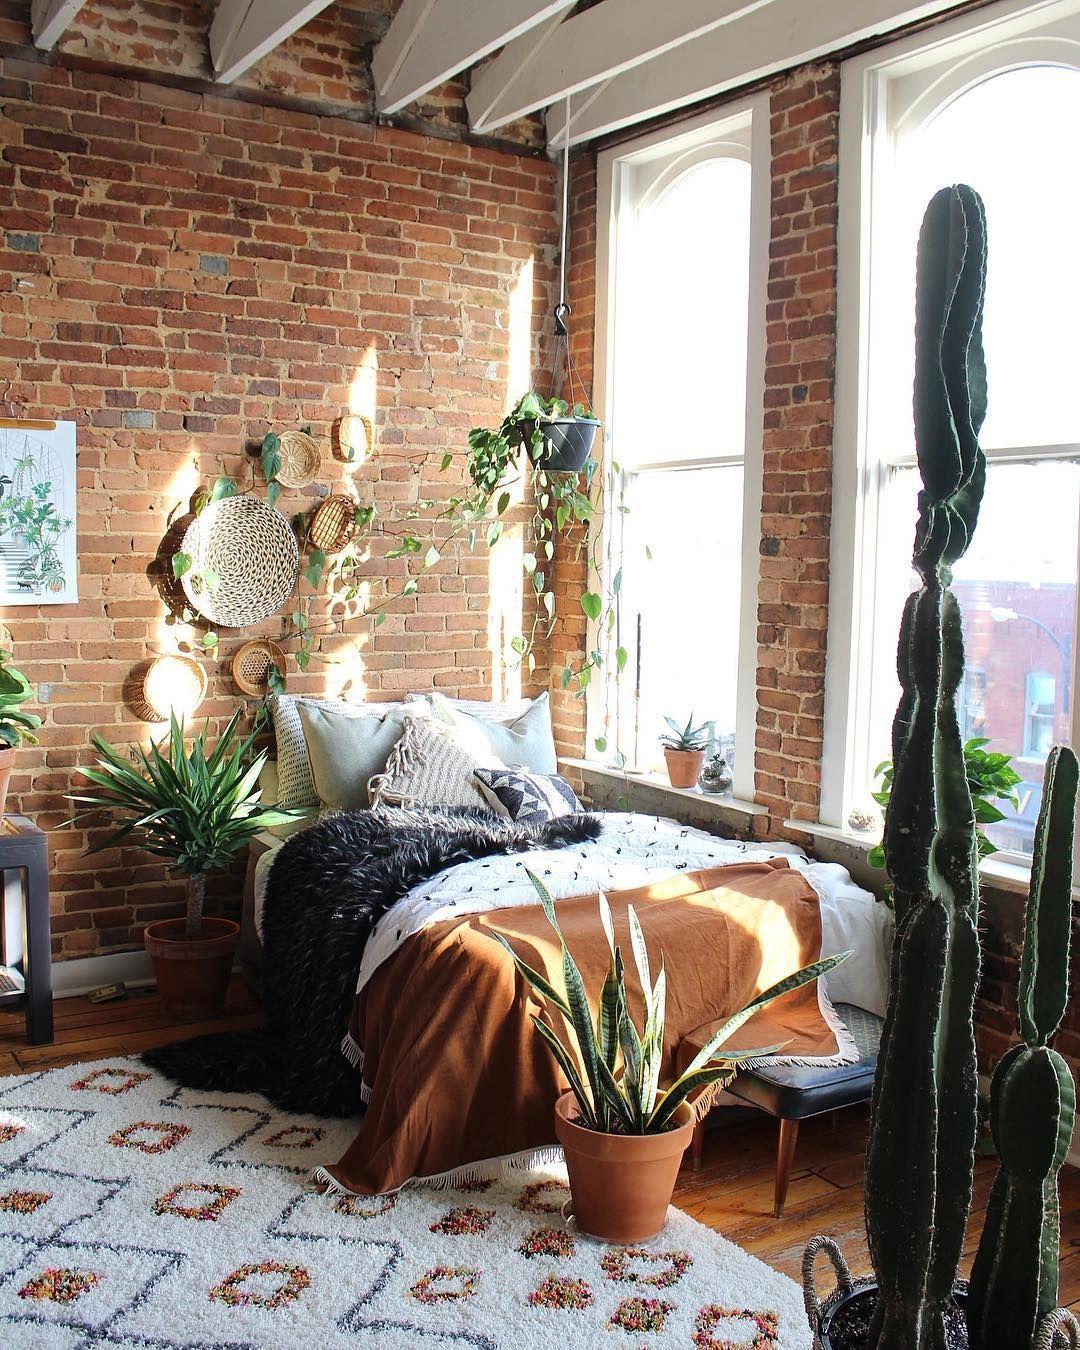 Refine Studios On Instagram What Boho Dreams Are Made Of Bohemian Bedroom Decor Room Decor Home Decor